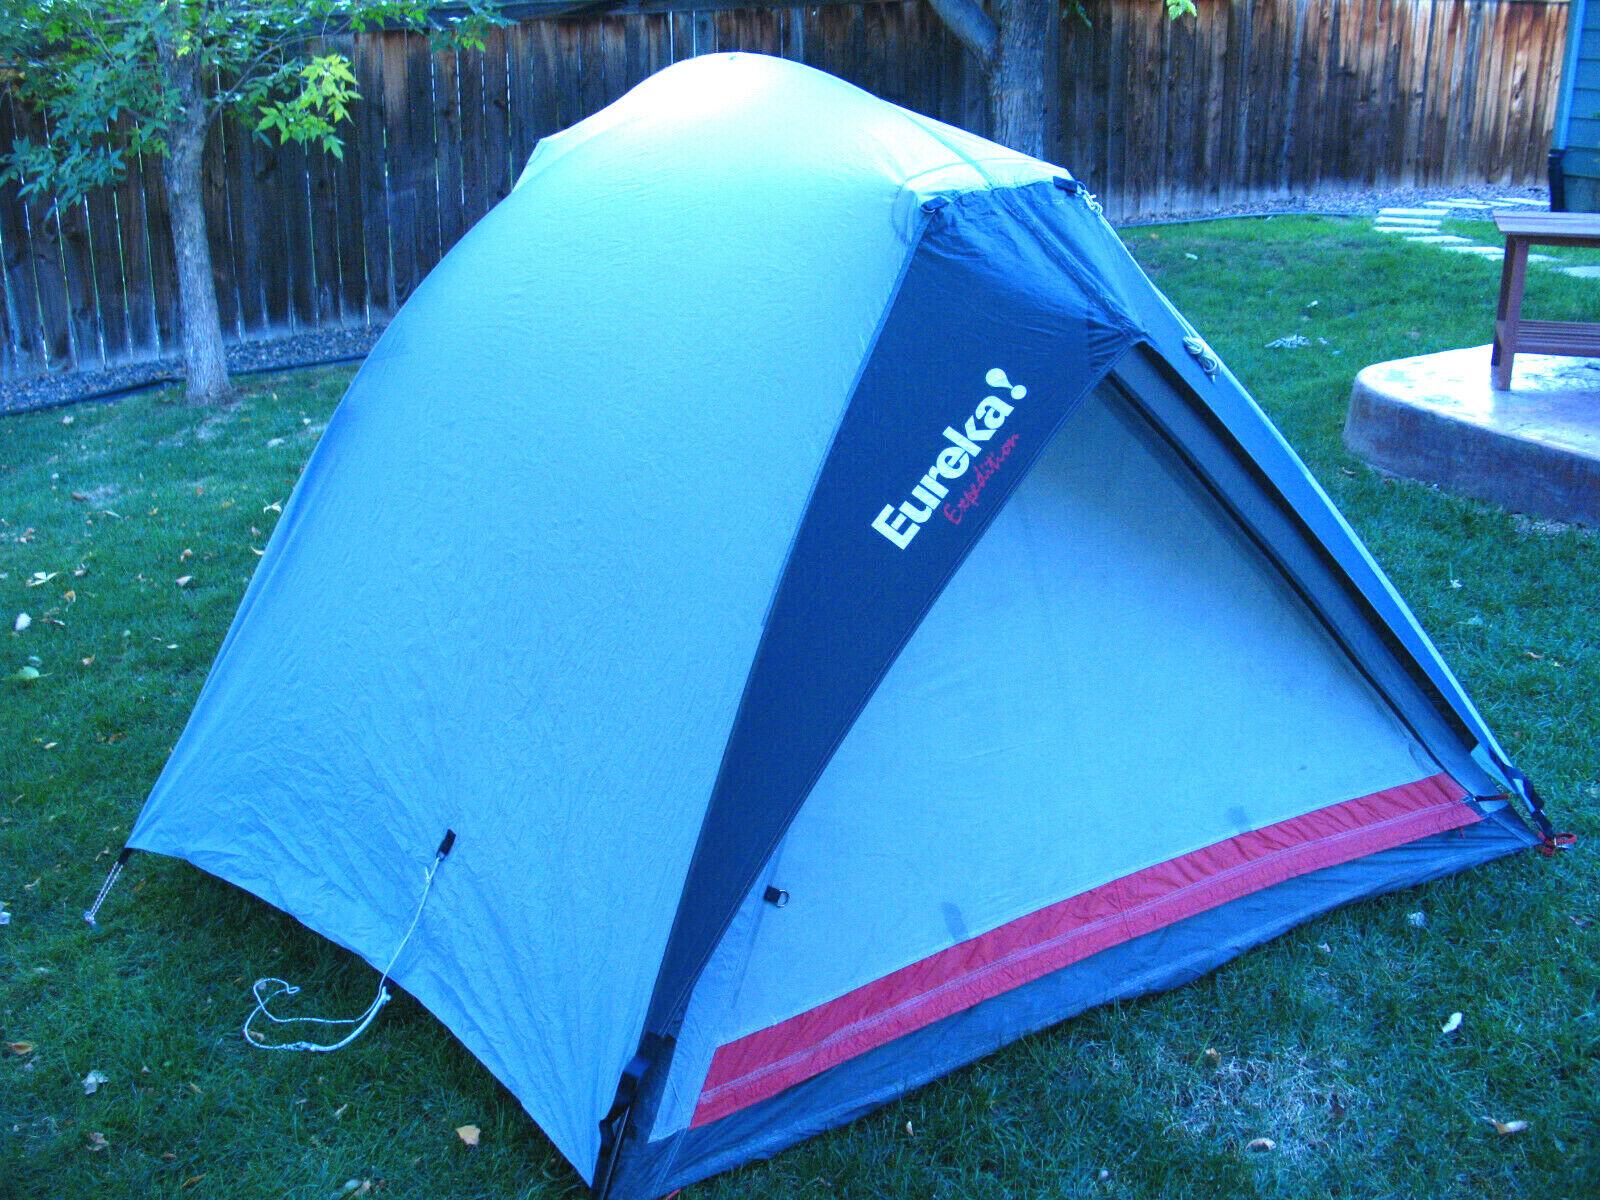 Eureka Expedizione Sentinel 4  4 Person 4 Season Tent  Very Sturdy Tent